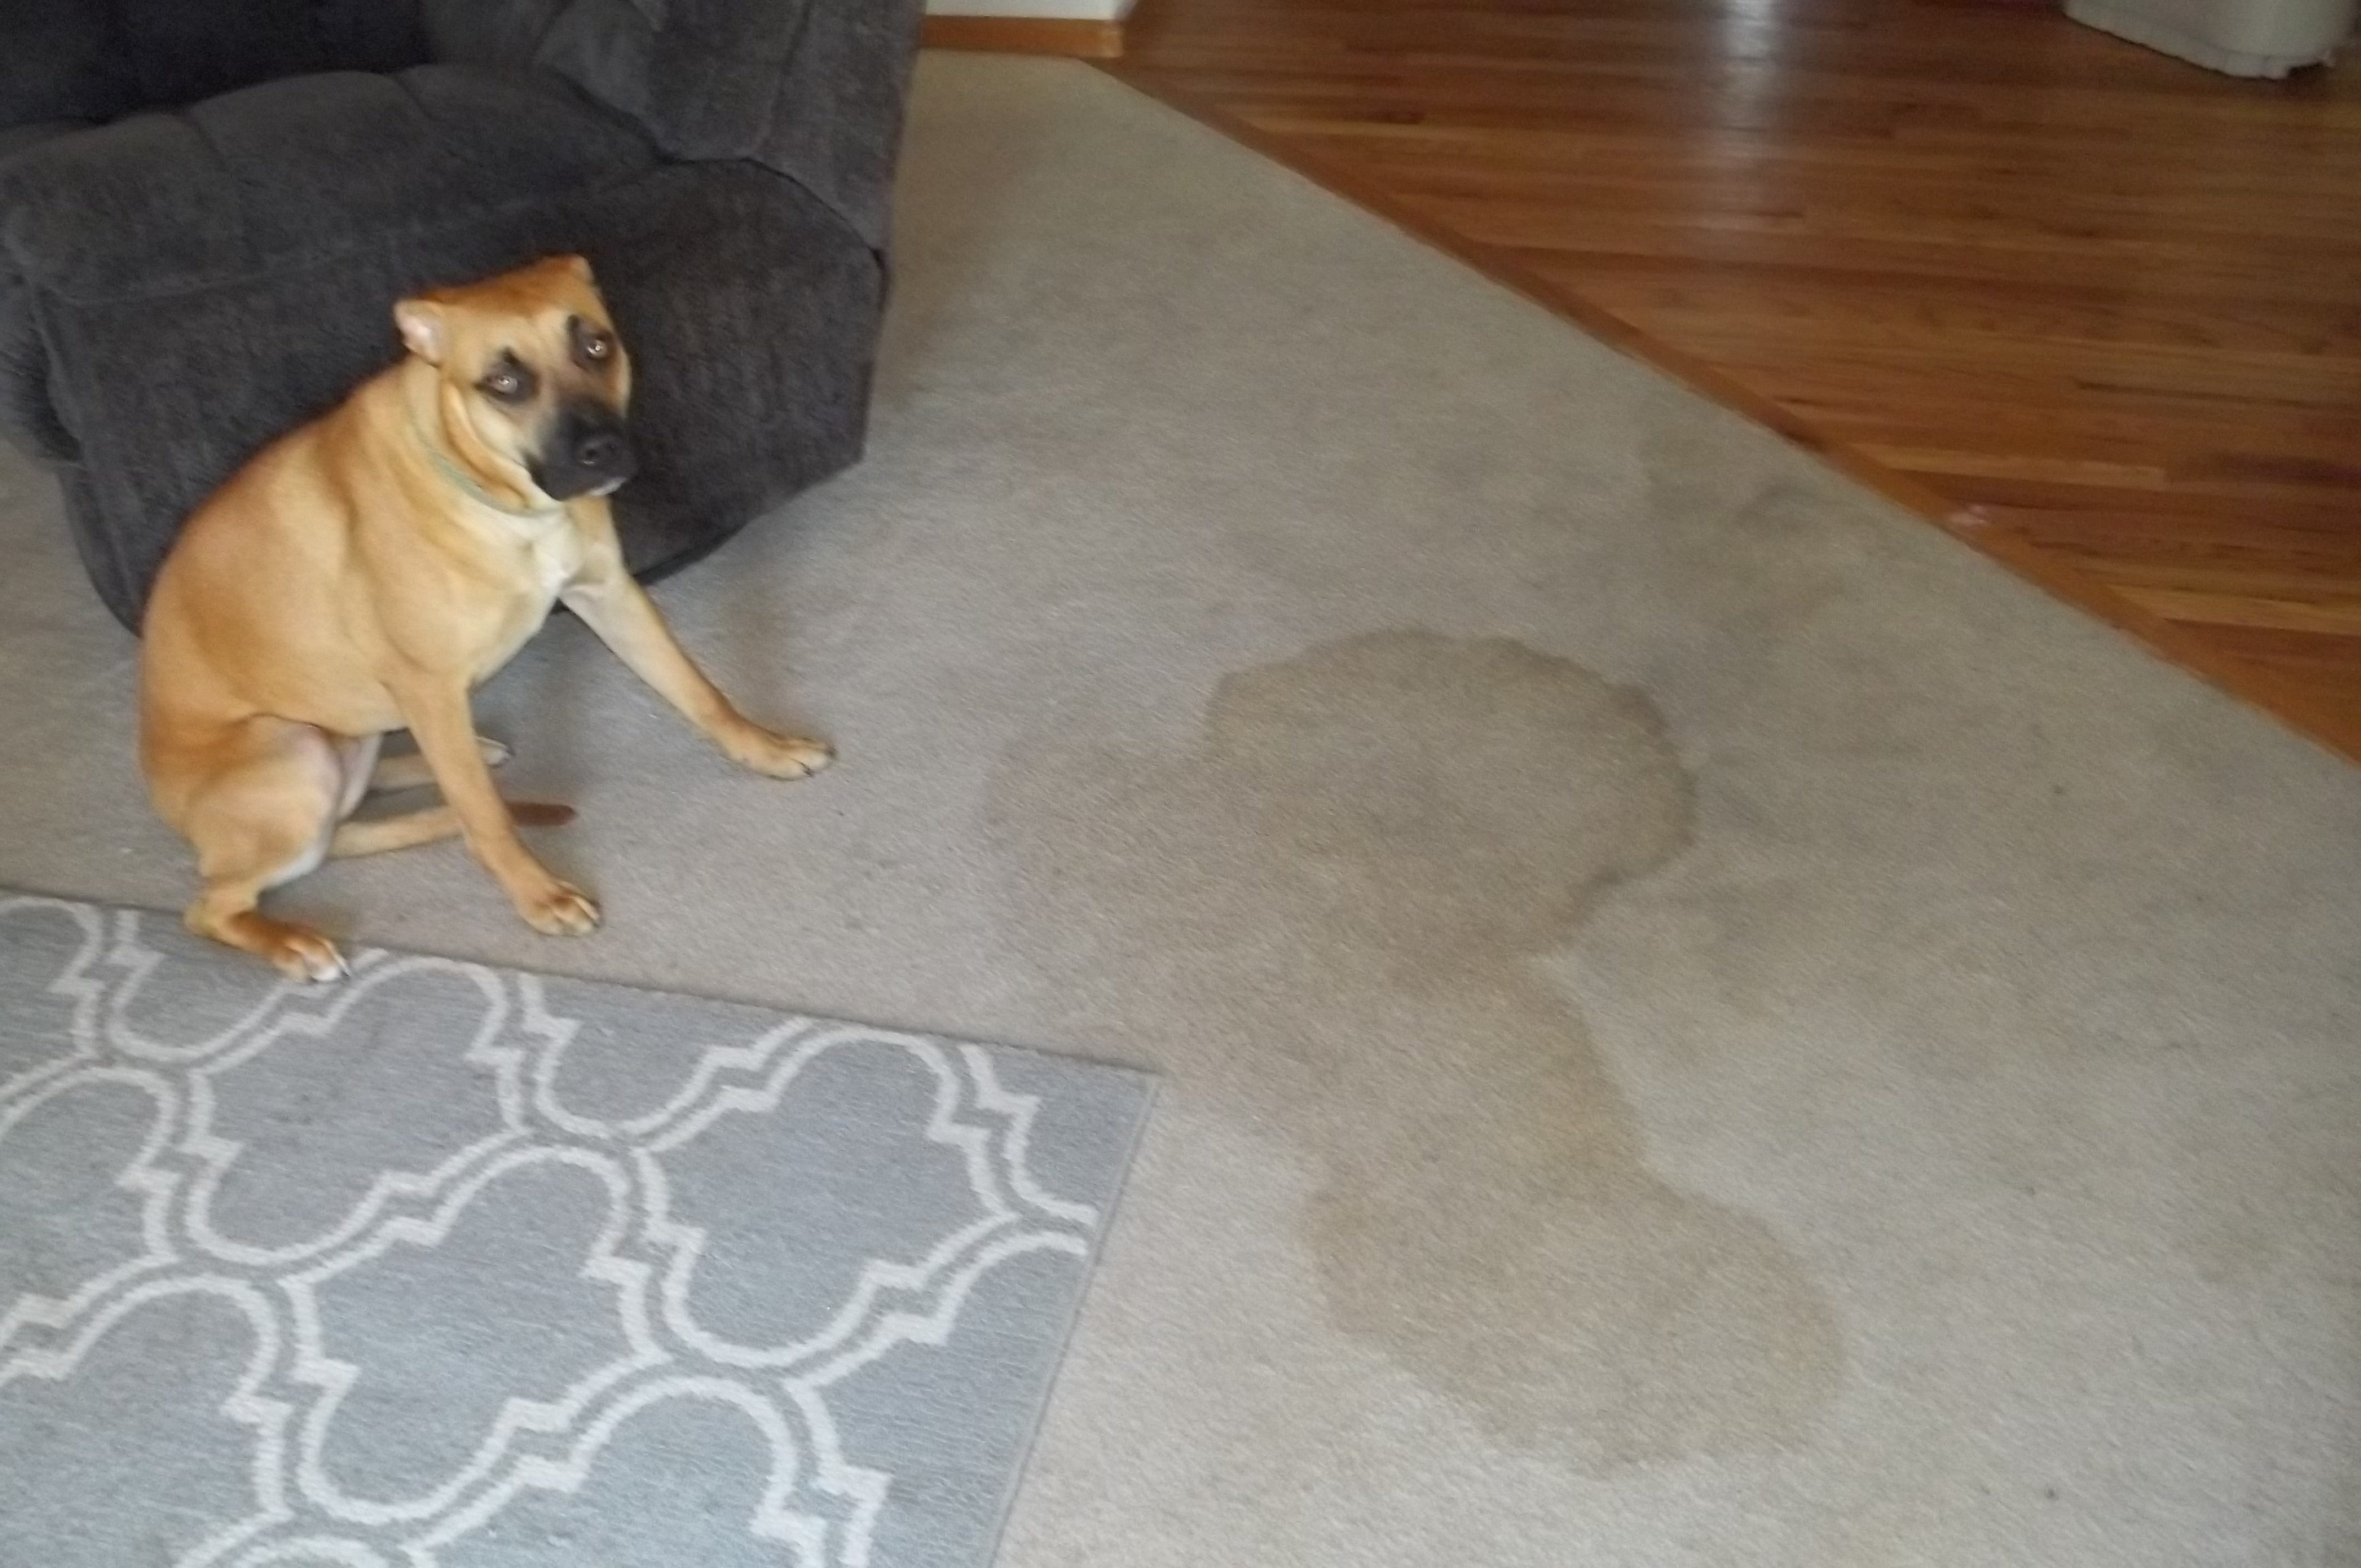 sad-dog-carpet-mess-Team-Clean-Colorado-Residue-Free-Carpet-Cleaning-Loveland